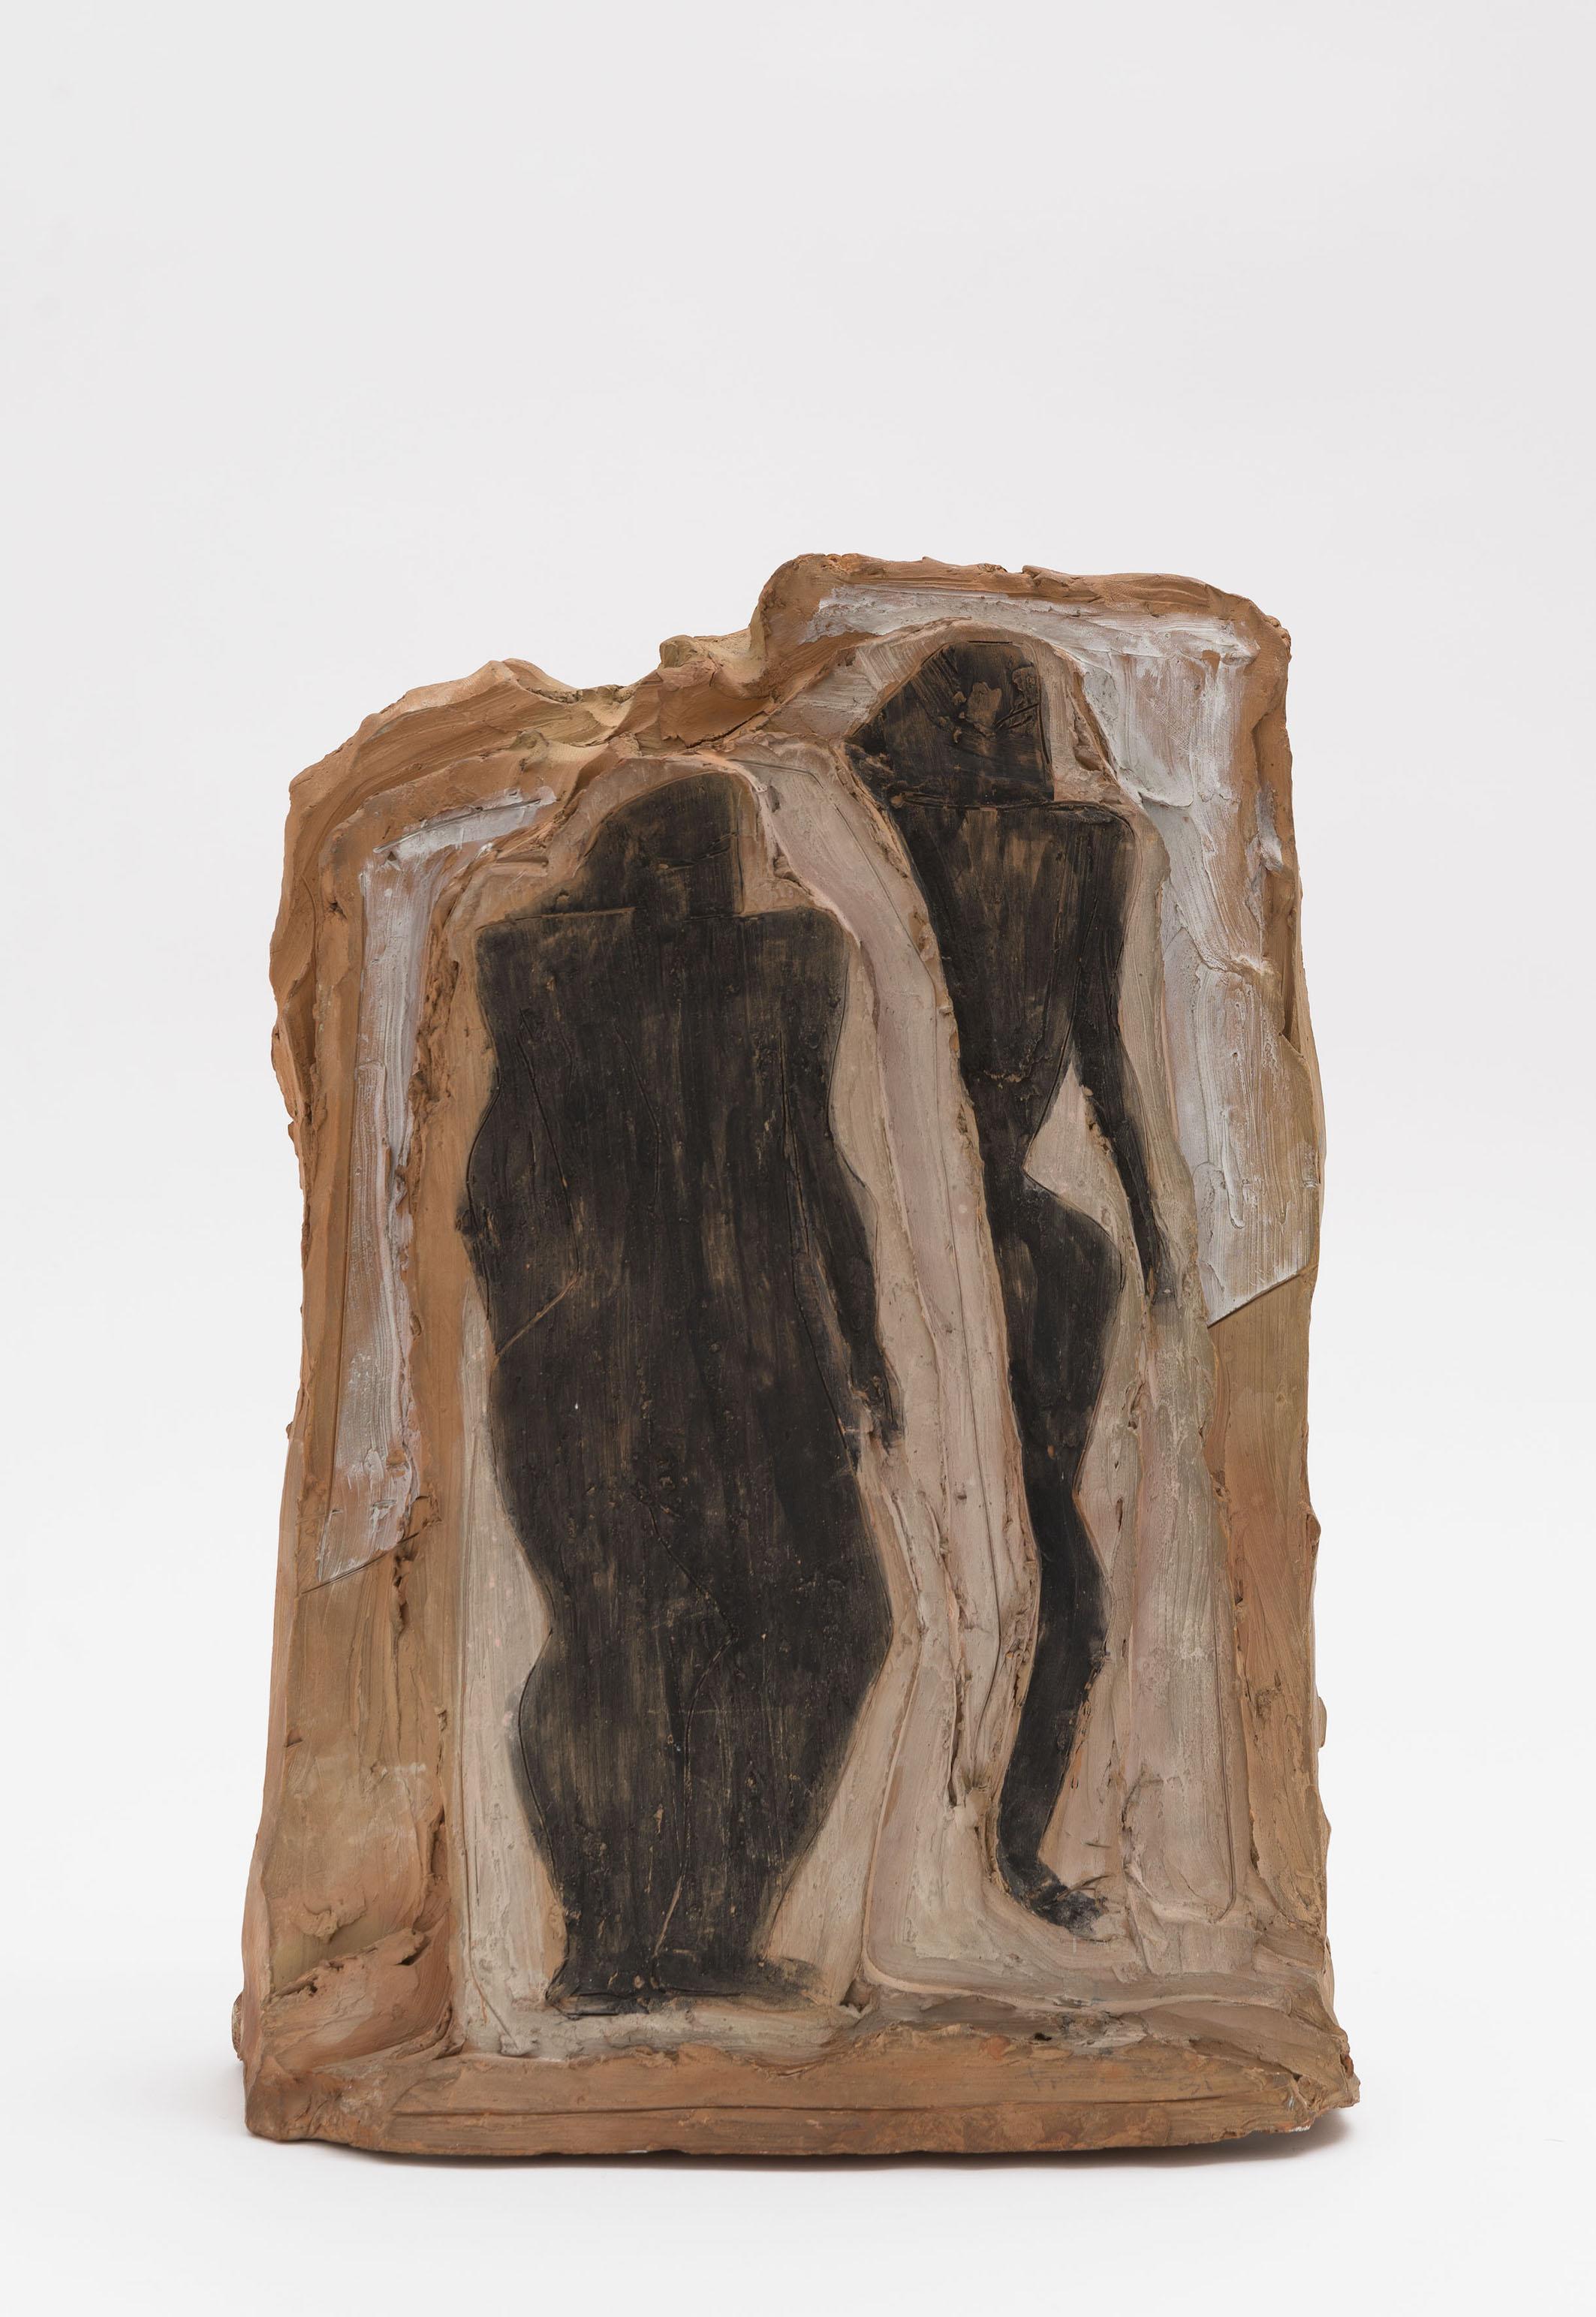 Lucio Fontana, Figure nere, 1937. Painted terracotta, 41 x 30 x 12.5 cm. © Fondazione Lucio Fontana by SIAE 2019 Courtesy Fondazione Lucio Fontana, Milano Photo: Daniele De Lonti